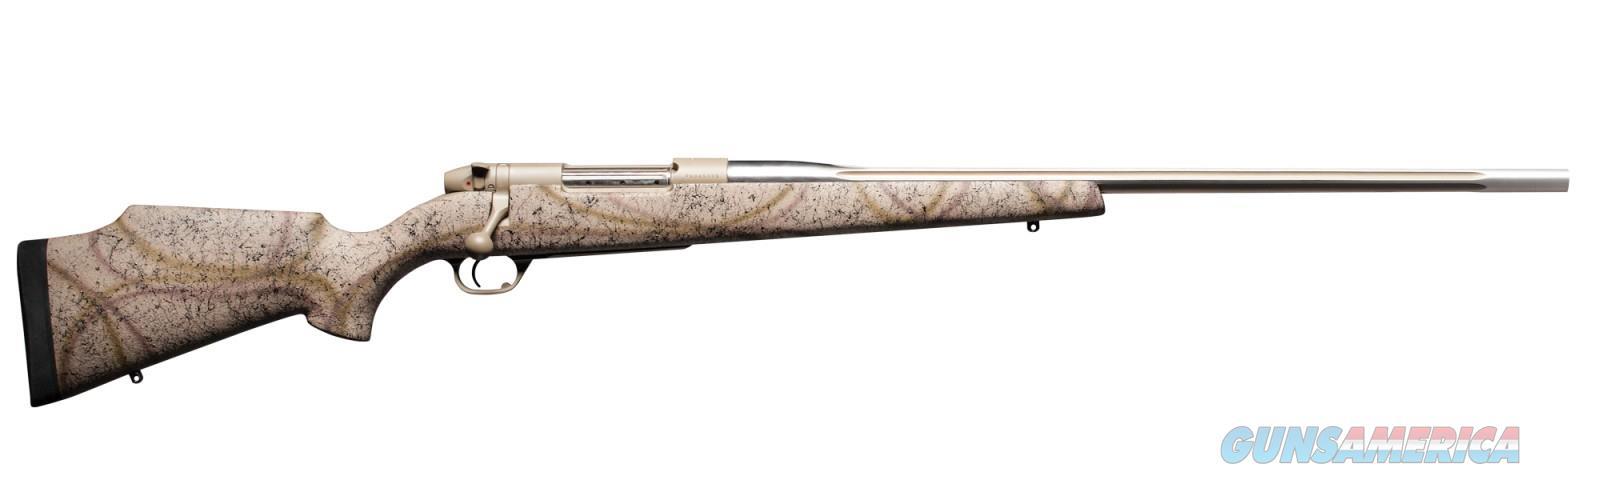 "Weatherby Mark V Terramark .300 Win Mag 26"" FDE/Desert Camo MATM300NR6O  Guns > Rifles > Weatherby Rifles > Sporting"